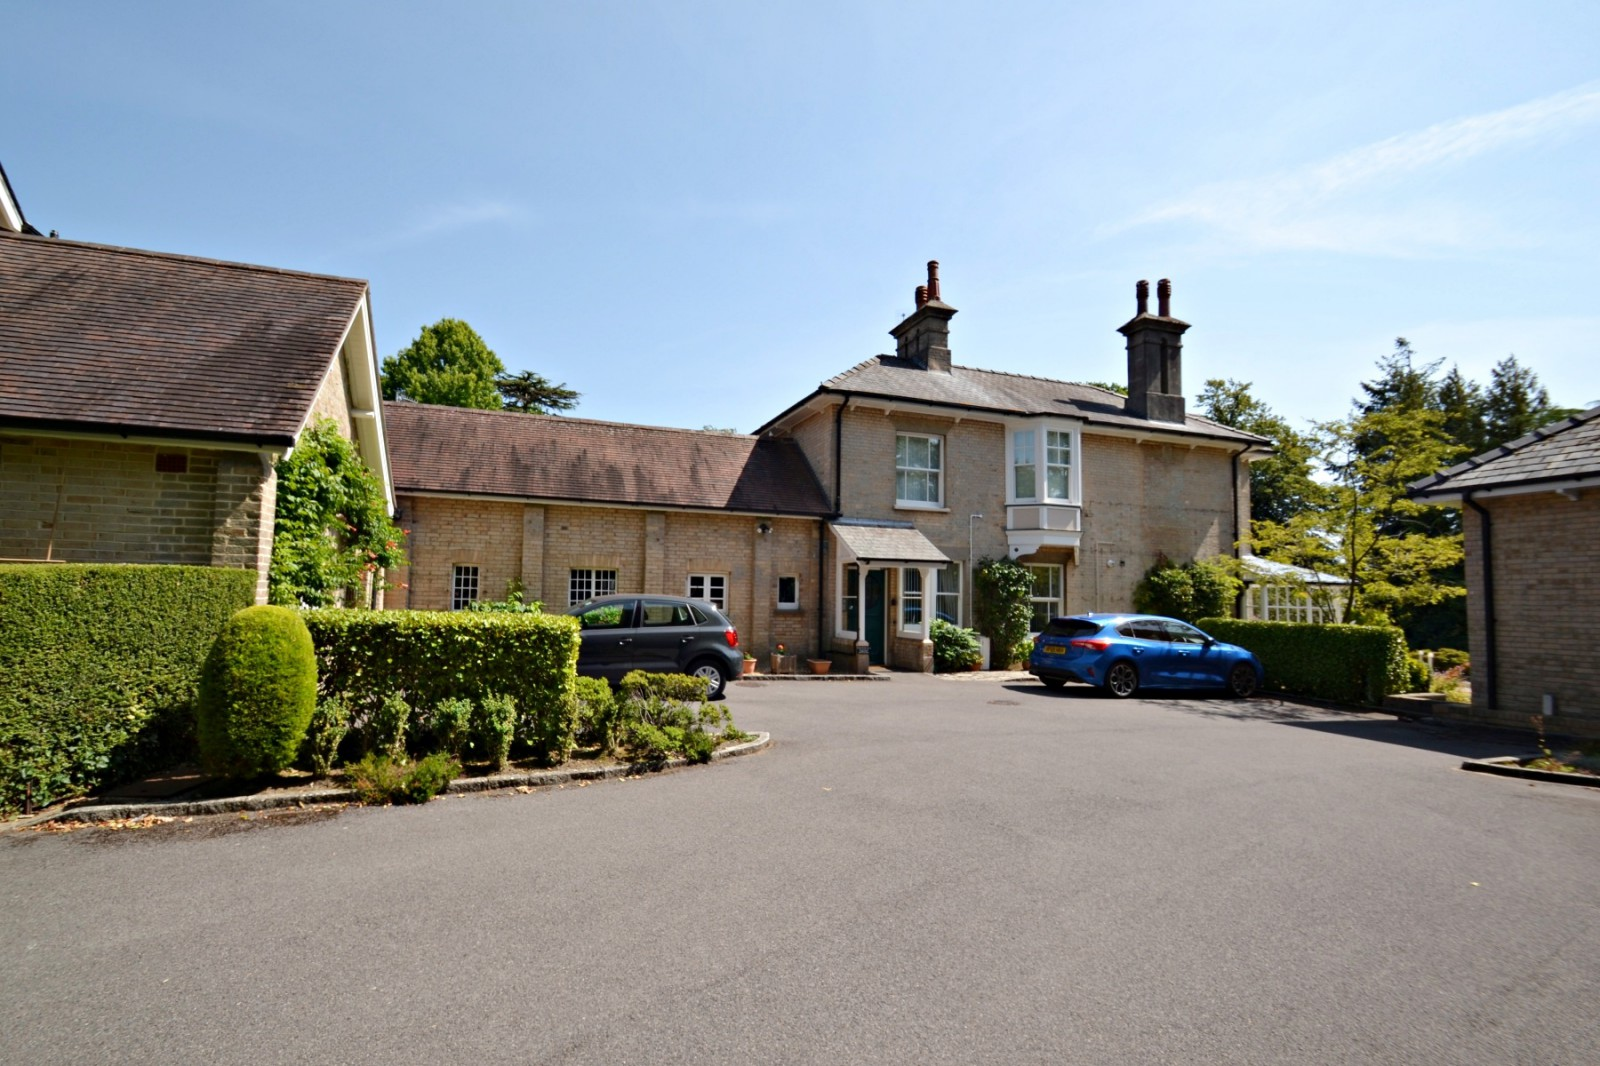 Ridgeway, Broadstone